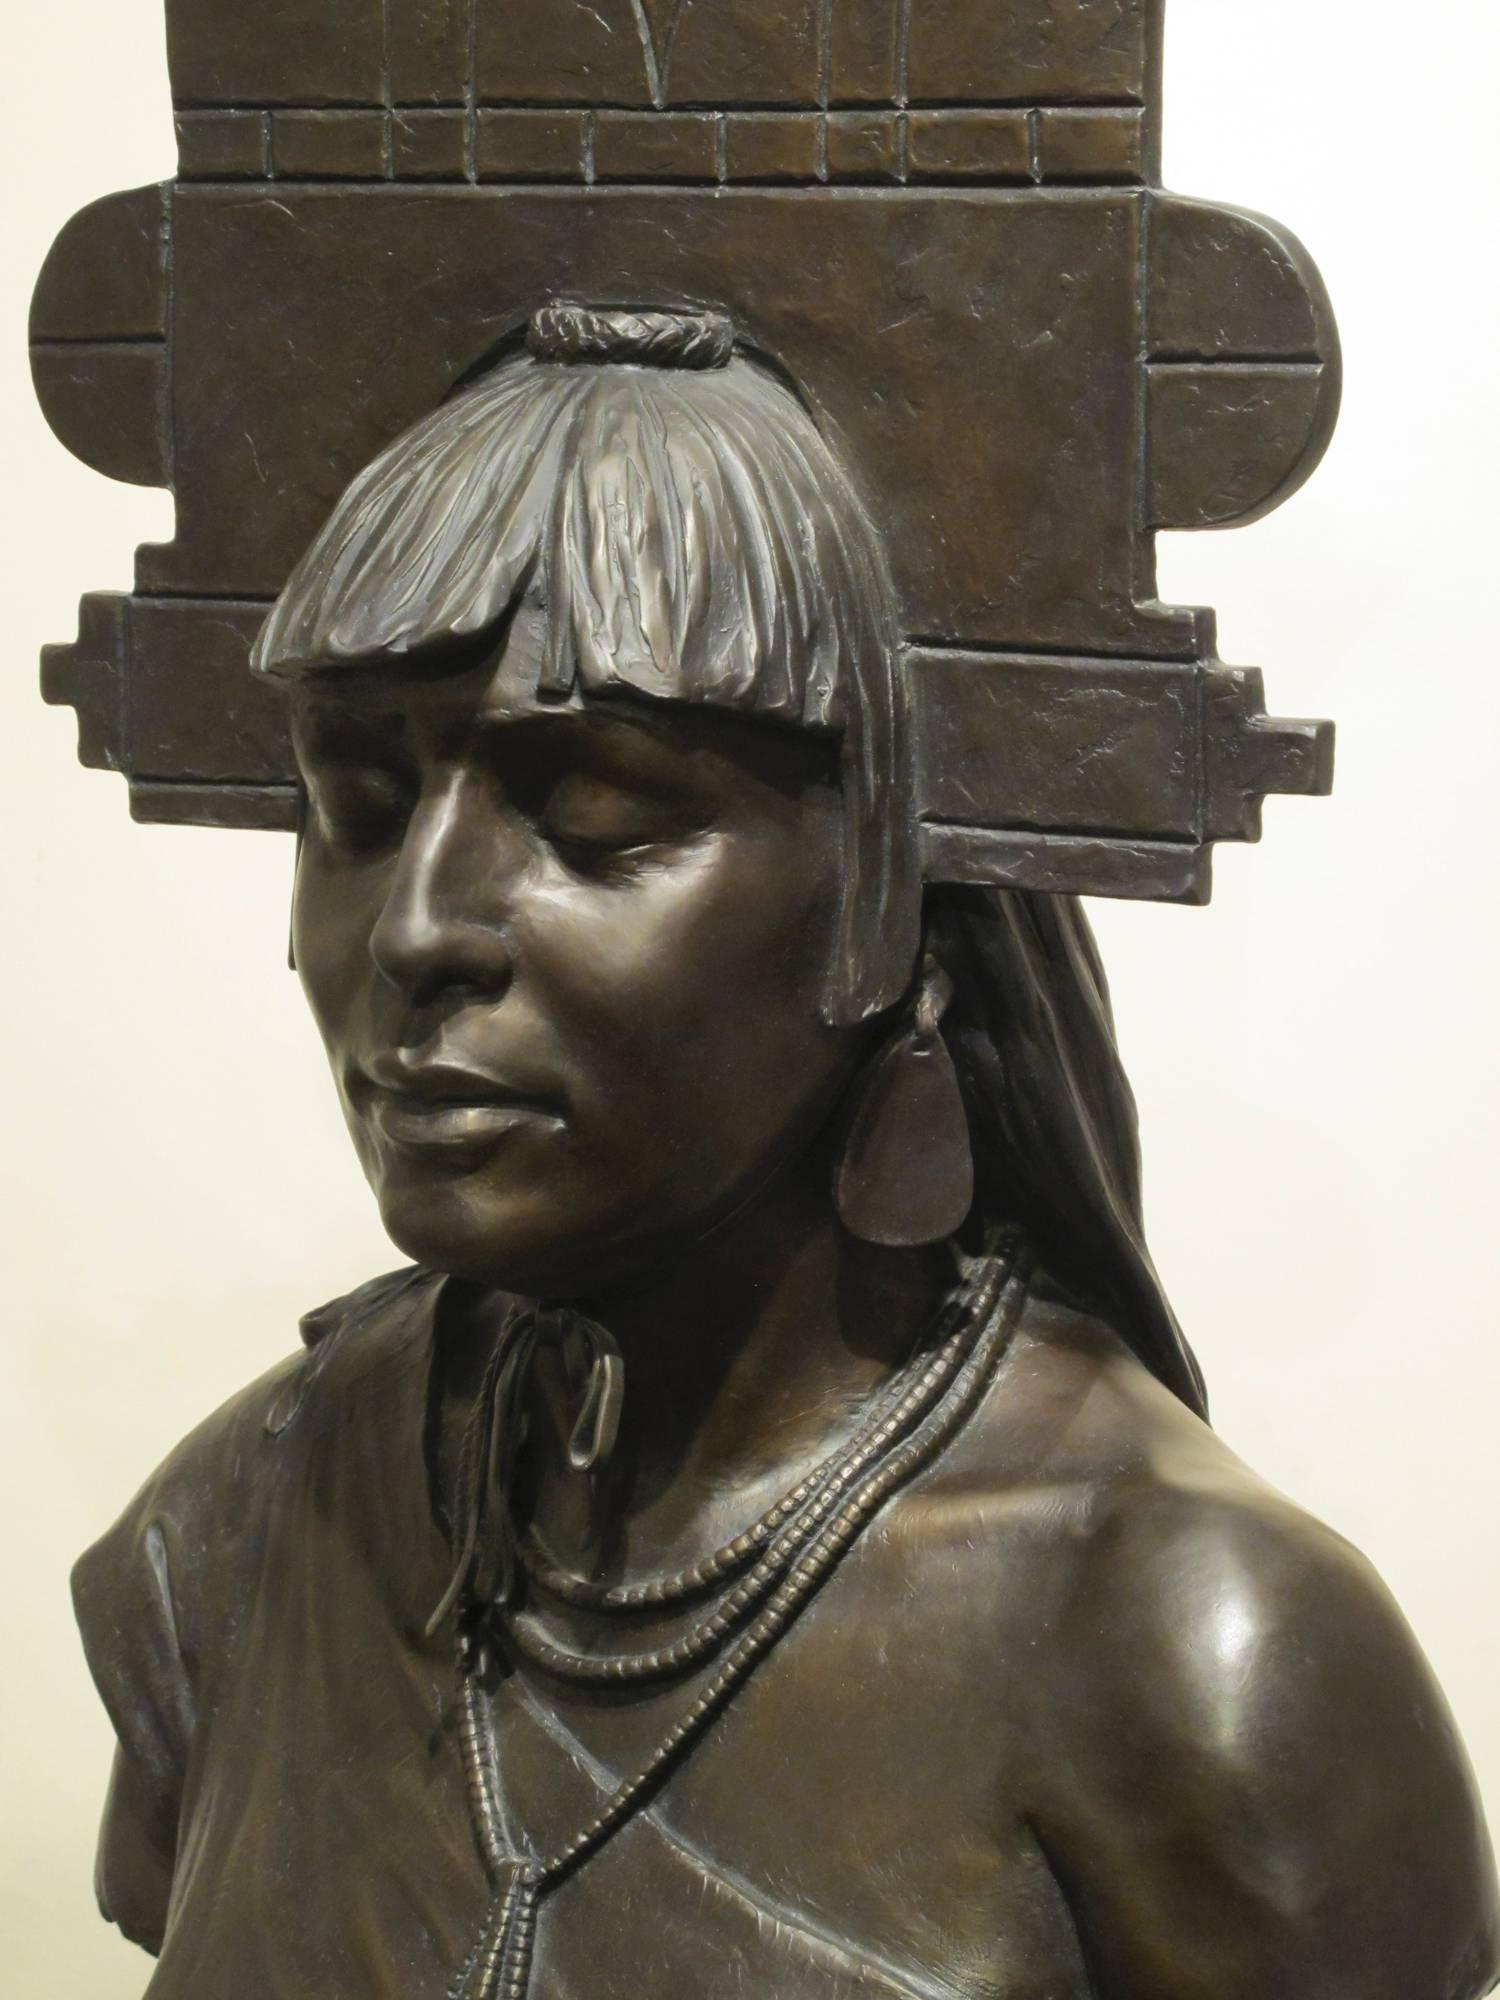 Tablita Paul Moore Pueblo Indian dancer, female headdress bronze limestone base